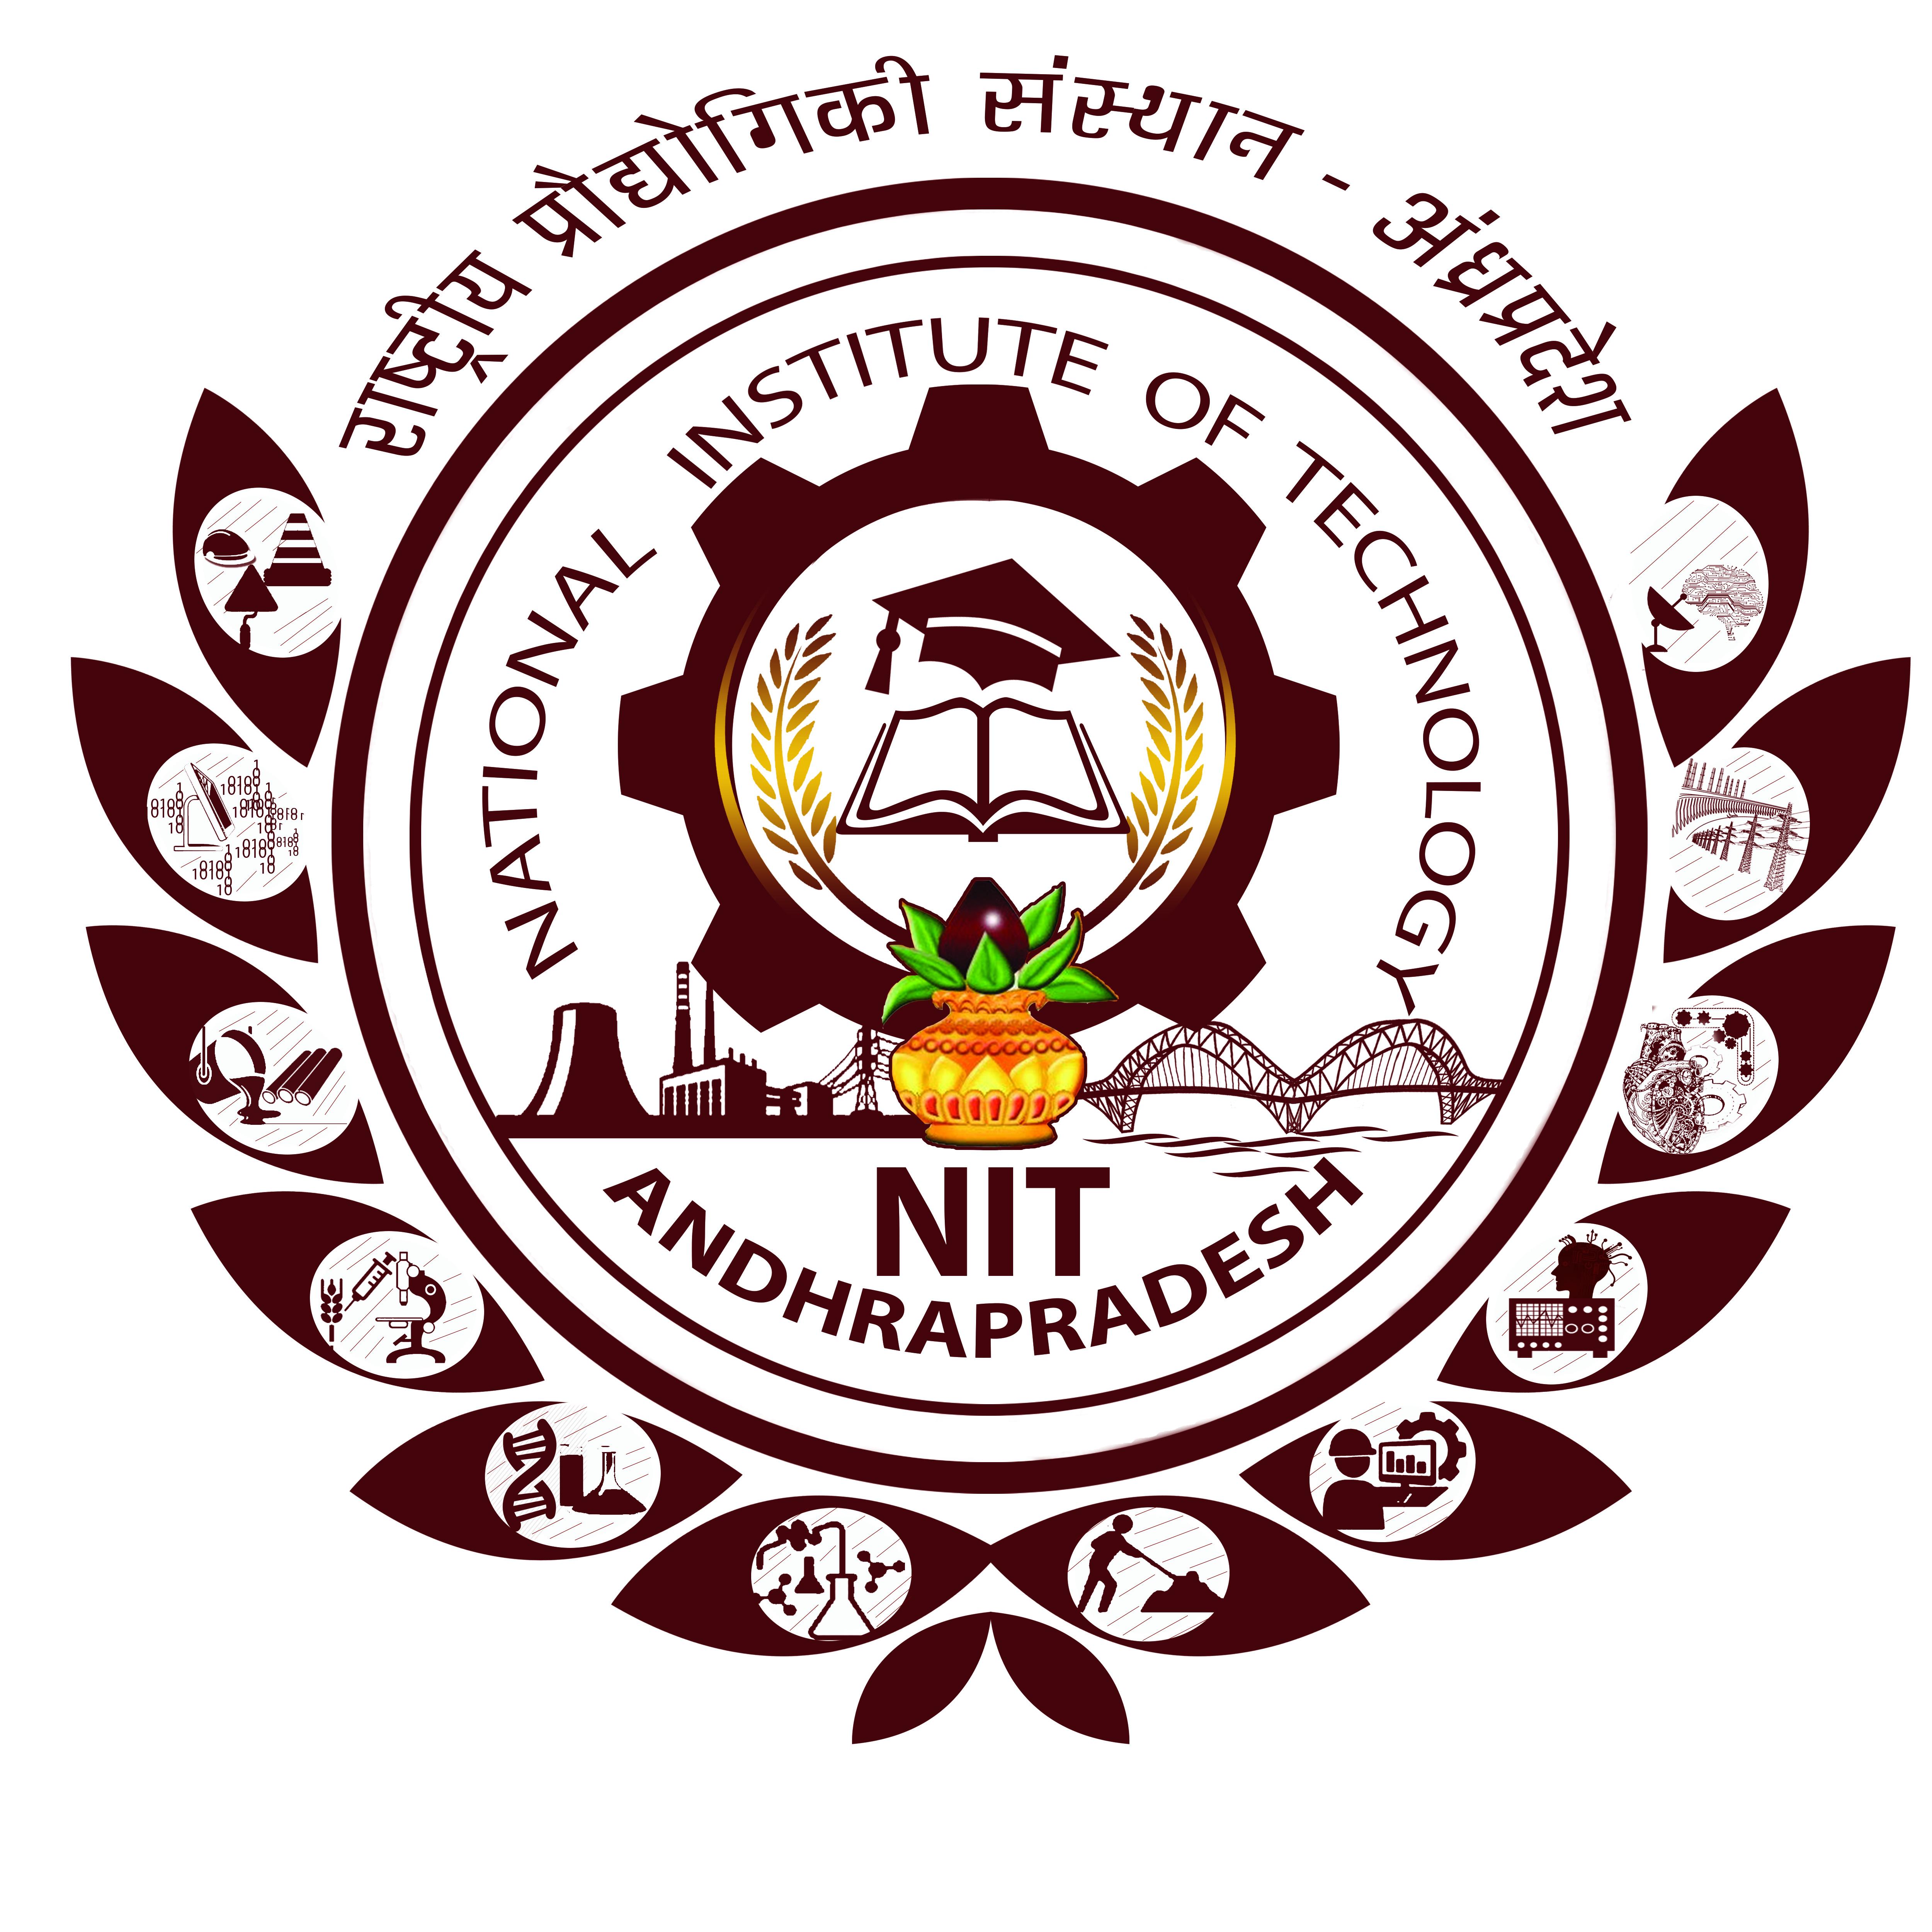 siva new logo nit - vectored